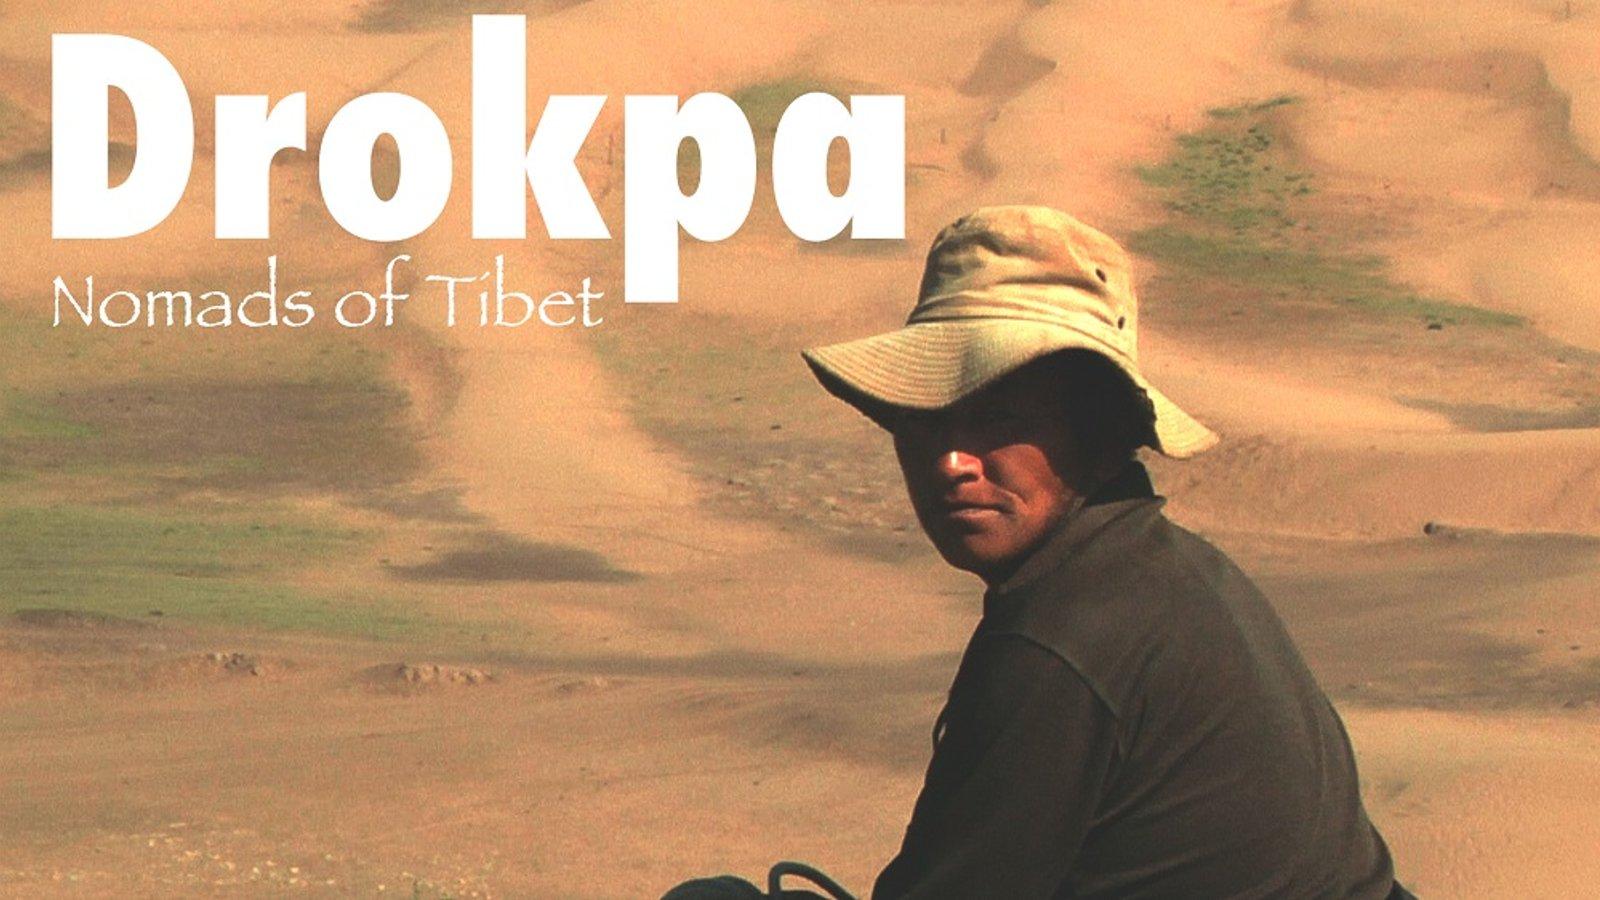 Drokpa - Nomads of Tibet